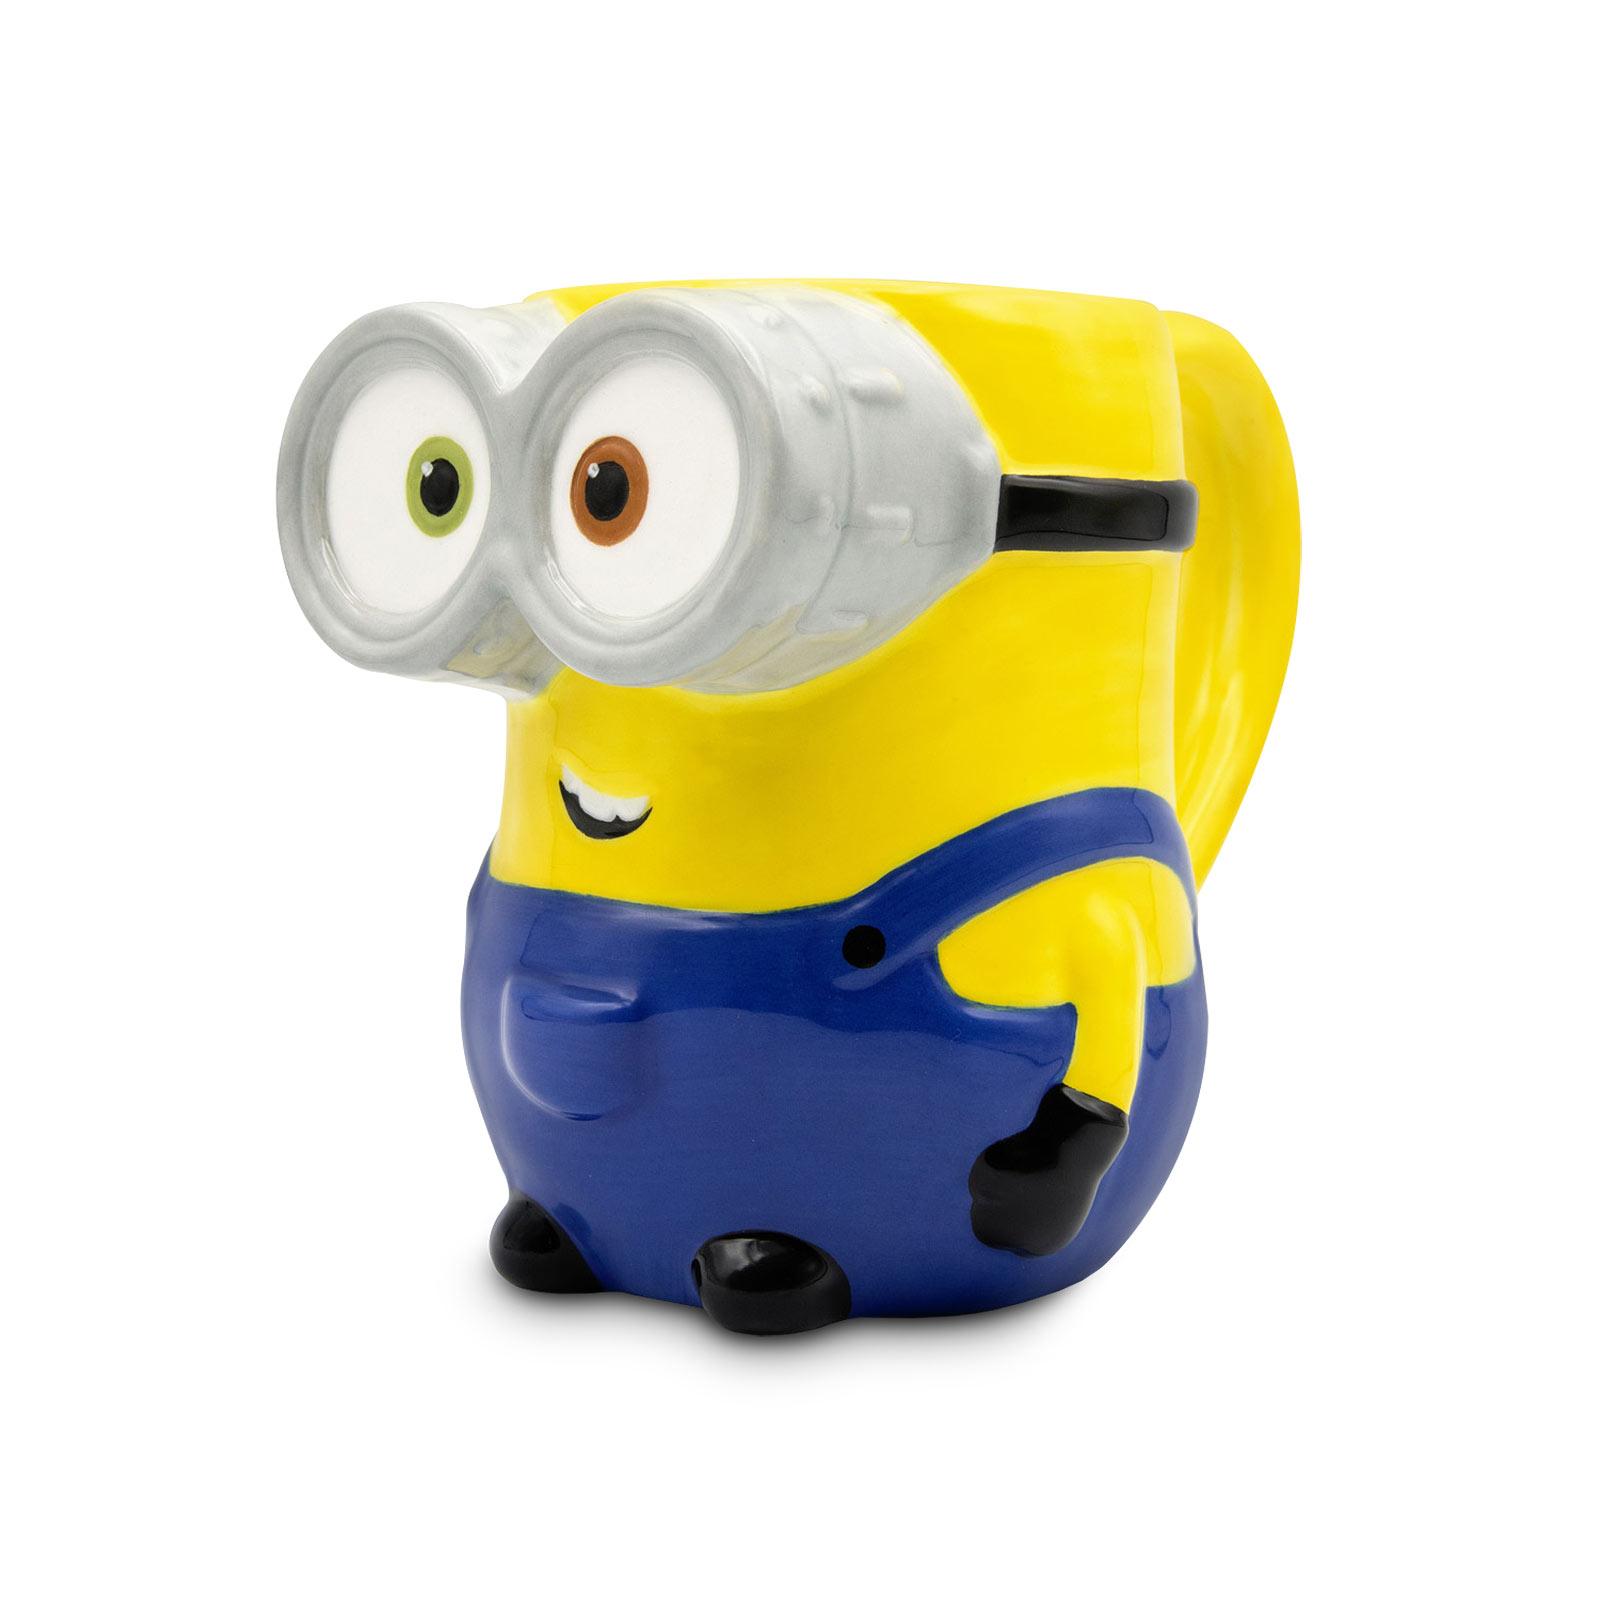 Bob 3D Tasse - Minions The Rise of Gru